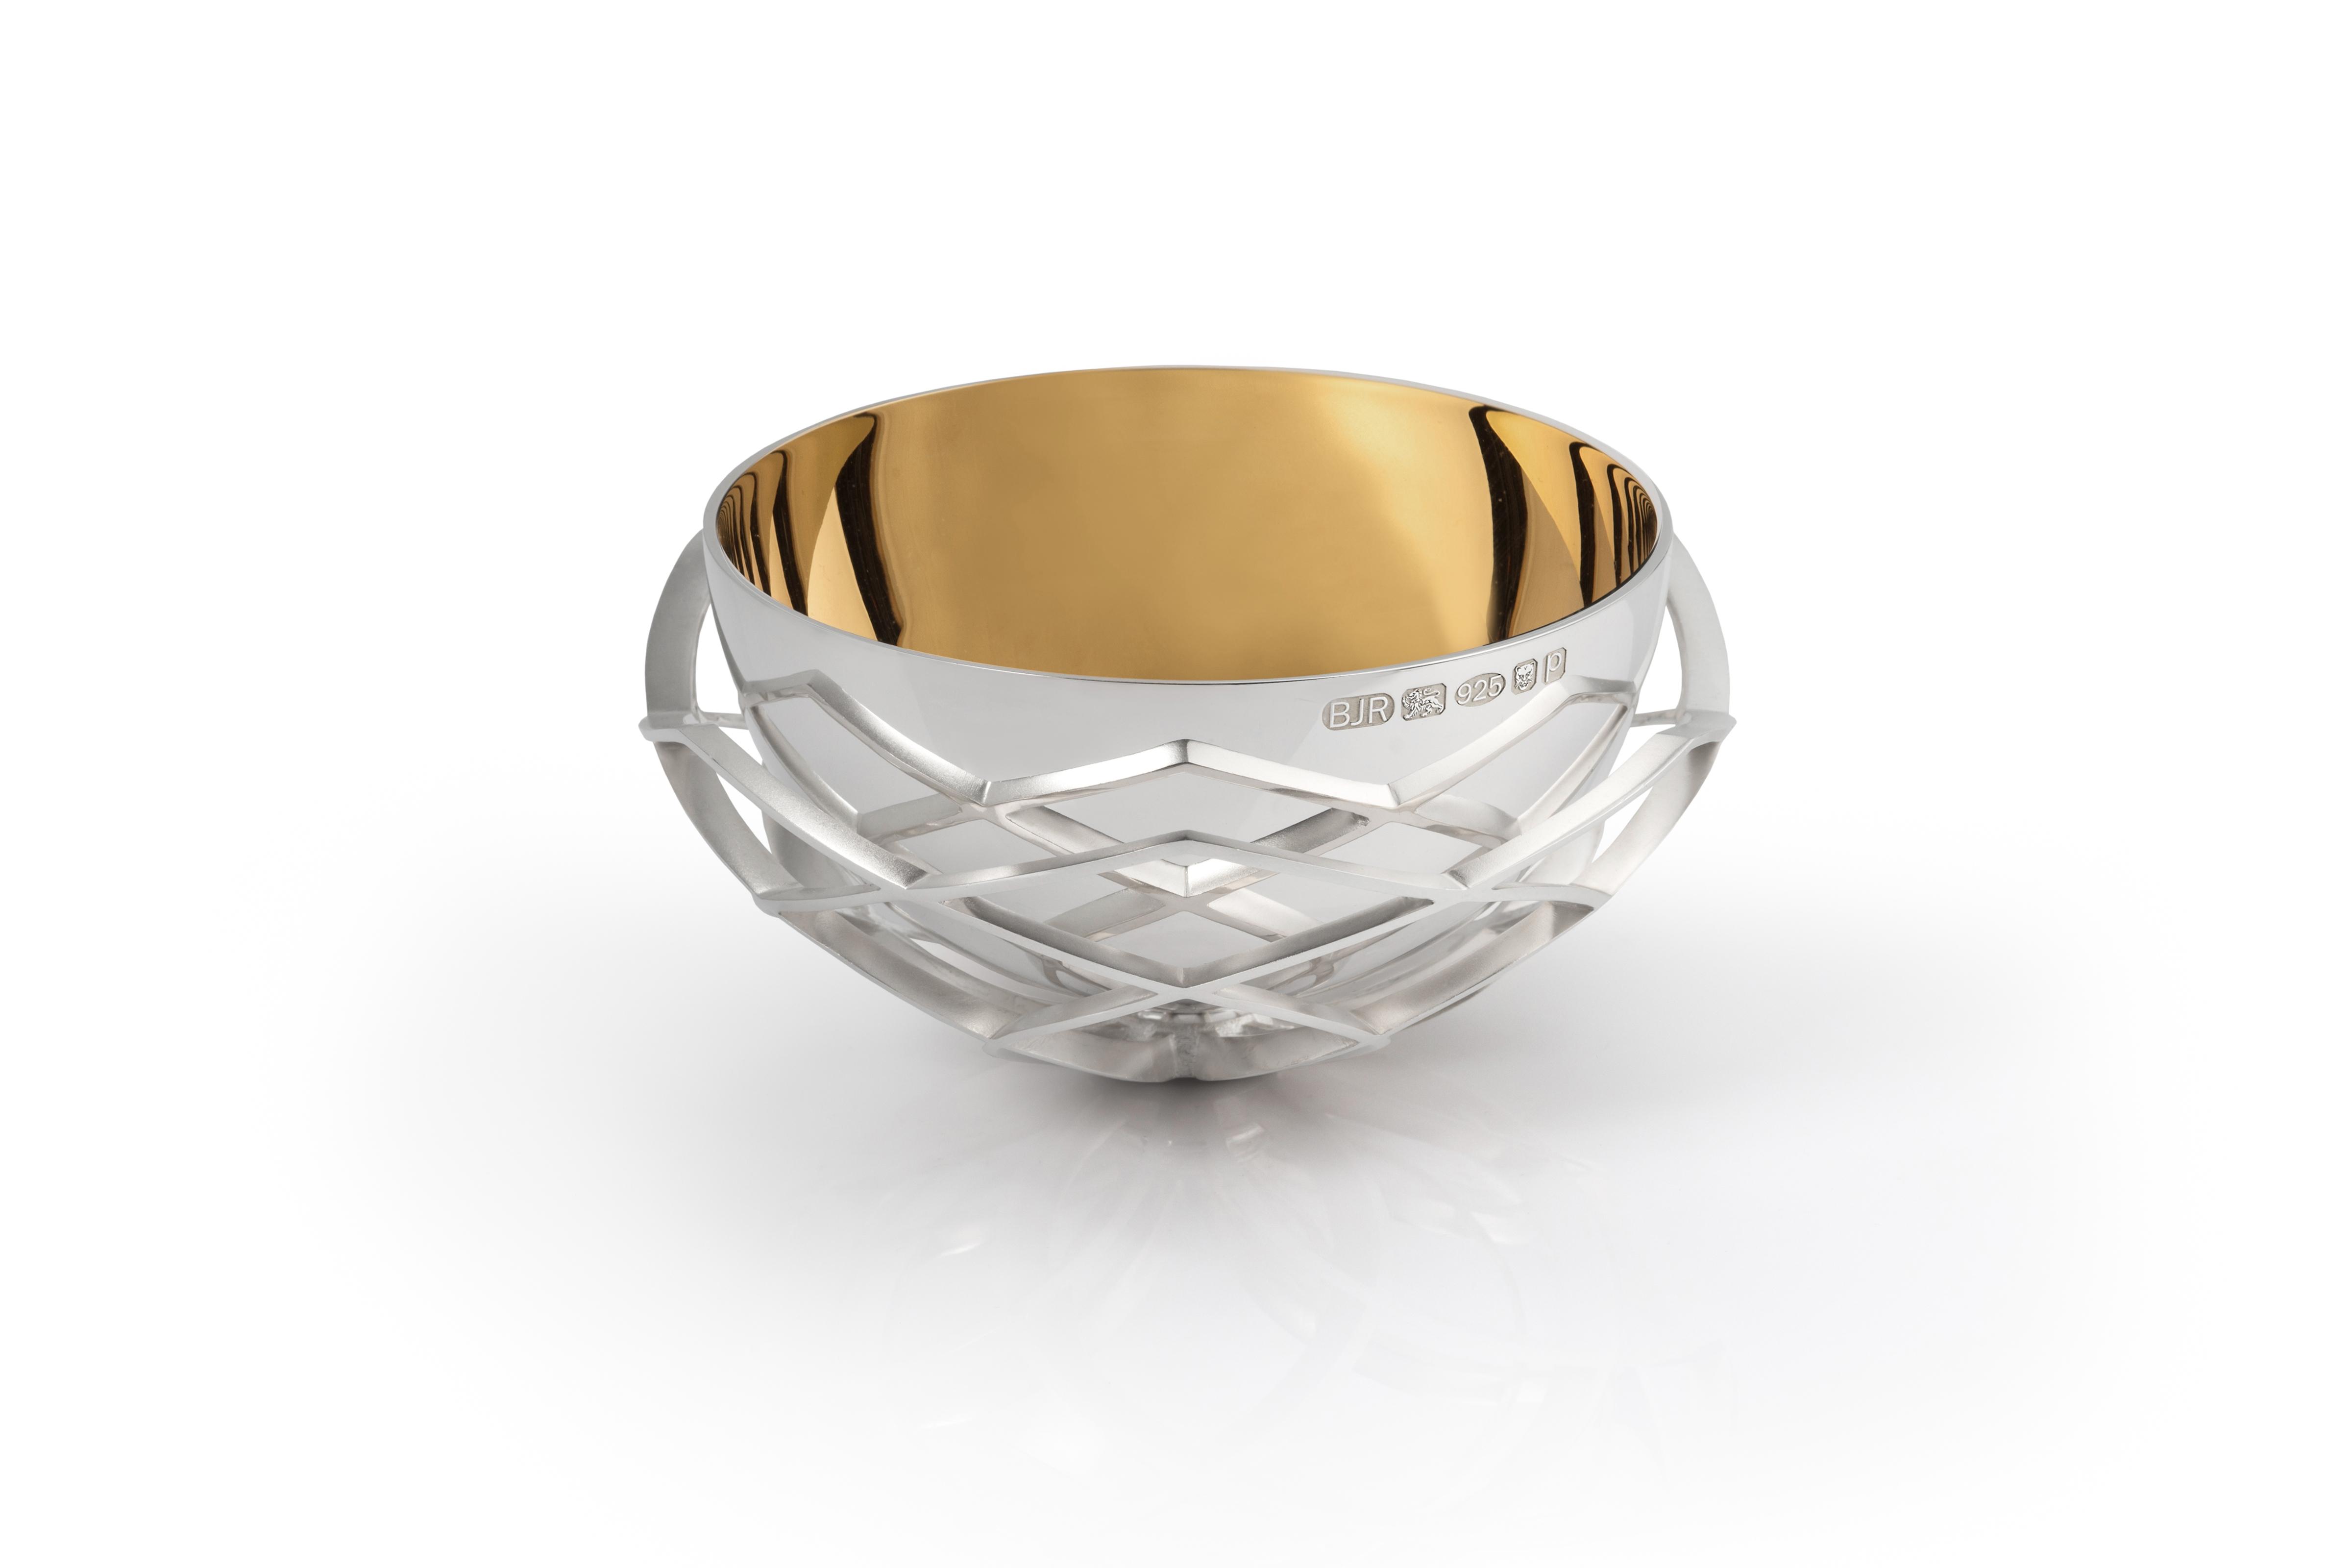 Luxus Bowl 2 – Copyright BJRdesigns